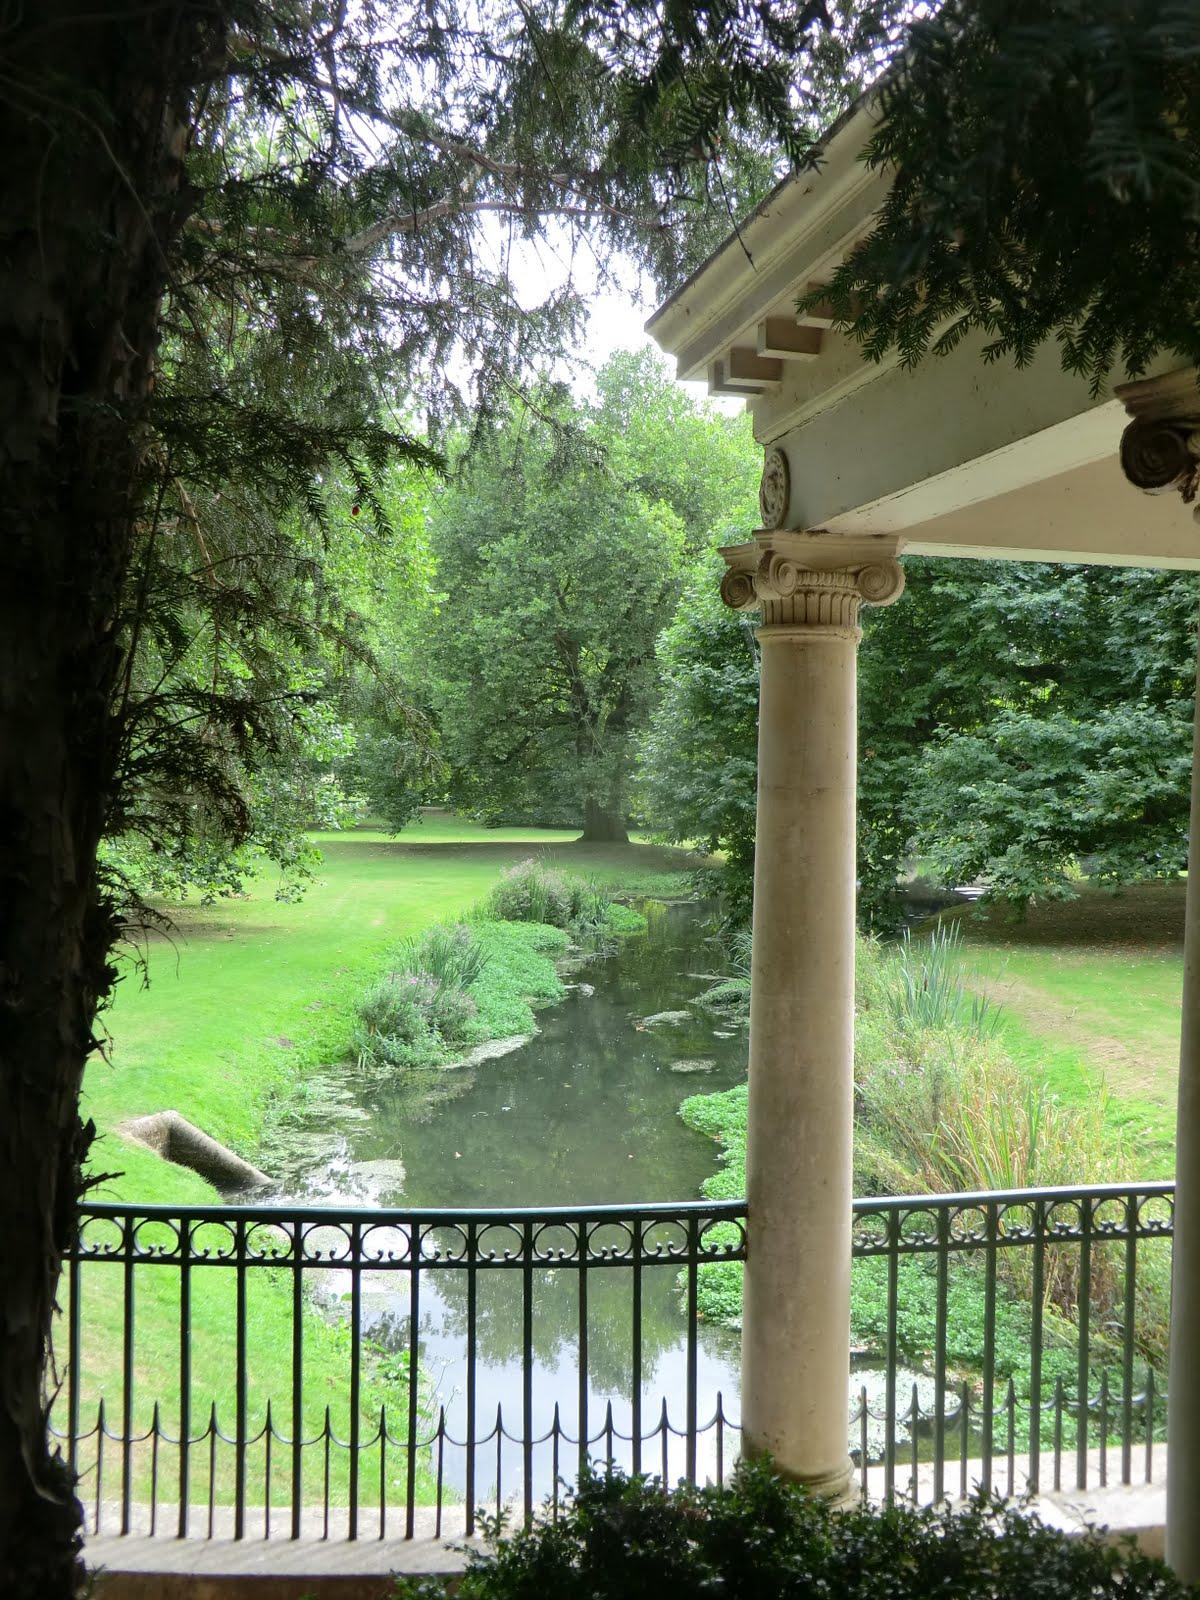 CIMG6031 A glimpse into Audley End Gardens